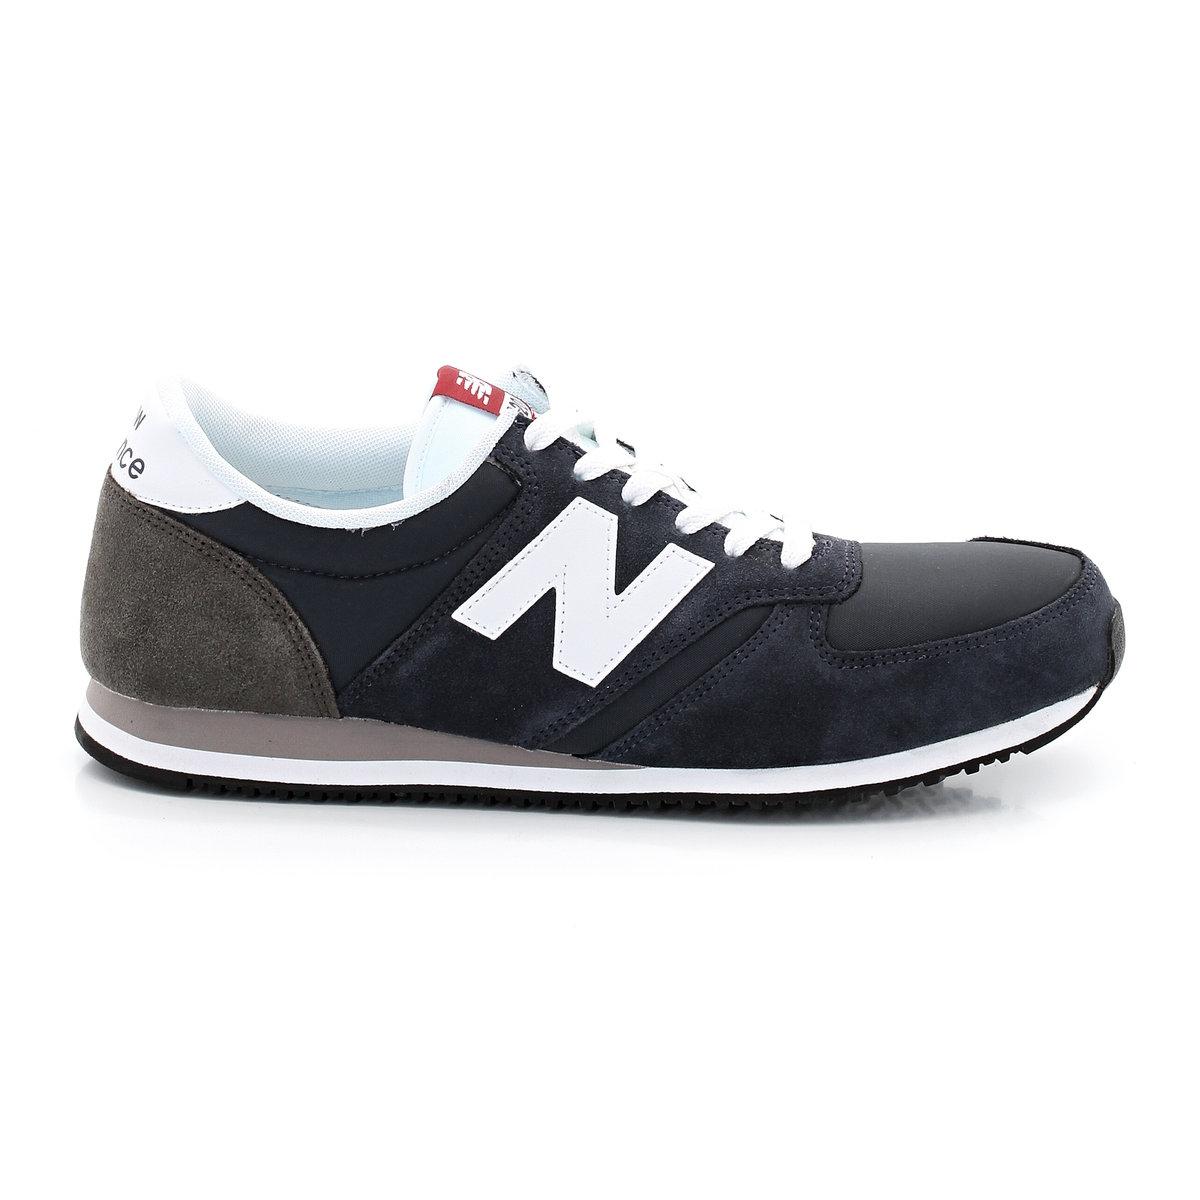 Кроссовки низкие NEW BALANCE U420CNWНизкие кроссовки NEW BALANCE U420CNW Подкладка: текстиль. Стелька: текстиль. Подошва: синтетика. Верх: замша + нейлон. Застёжка: шнуровка<br><br>Цвет: темно-синий<br>Размер: 39 1/2.42